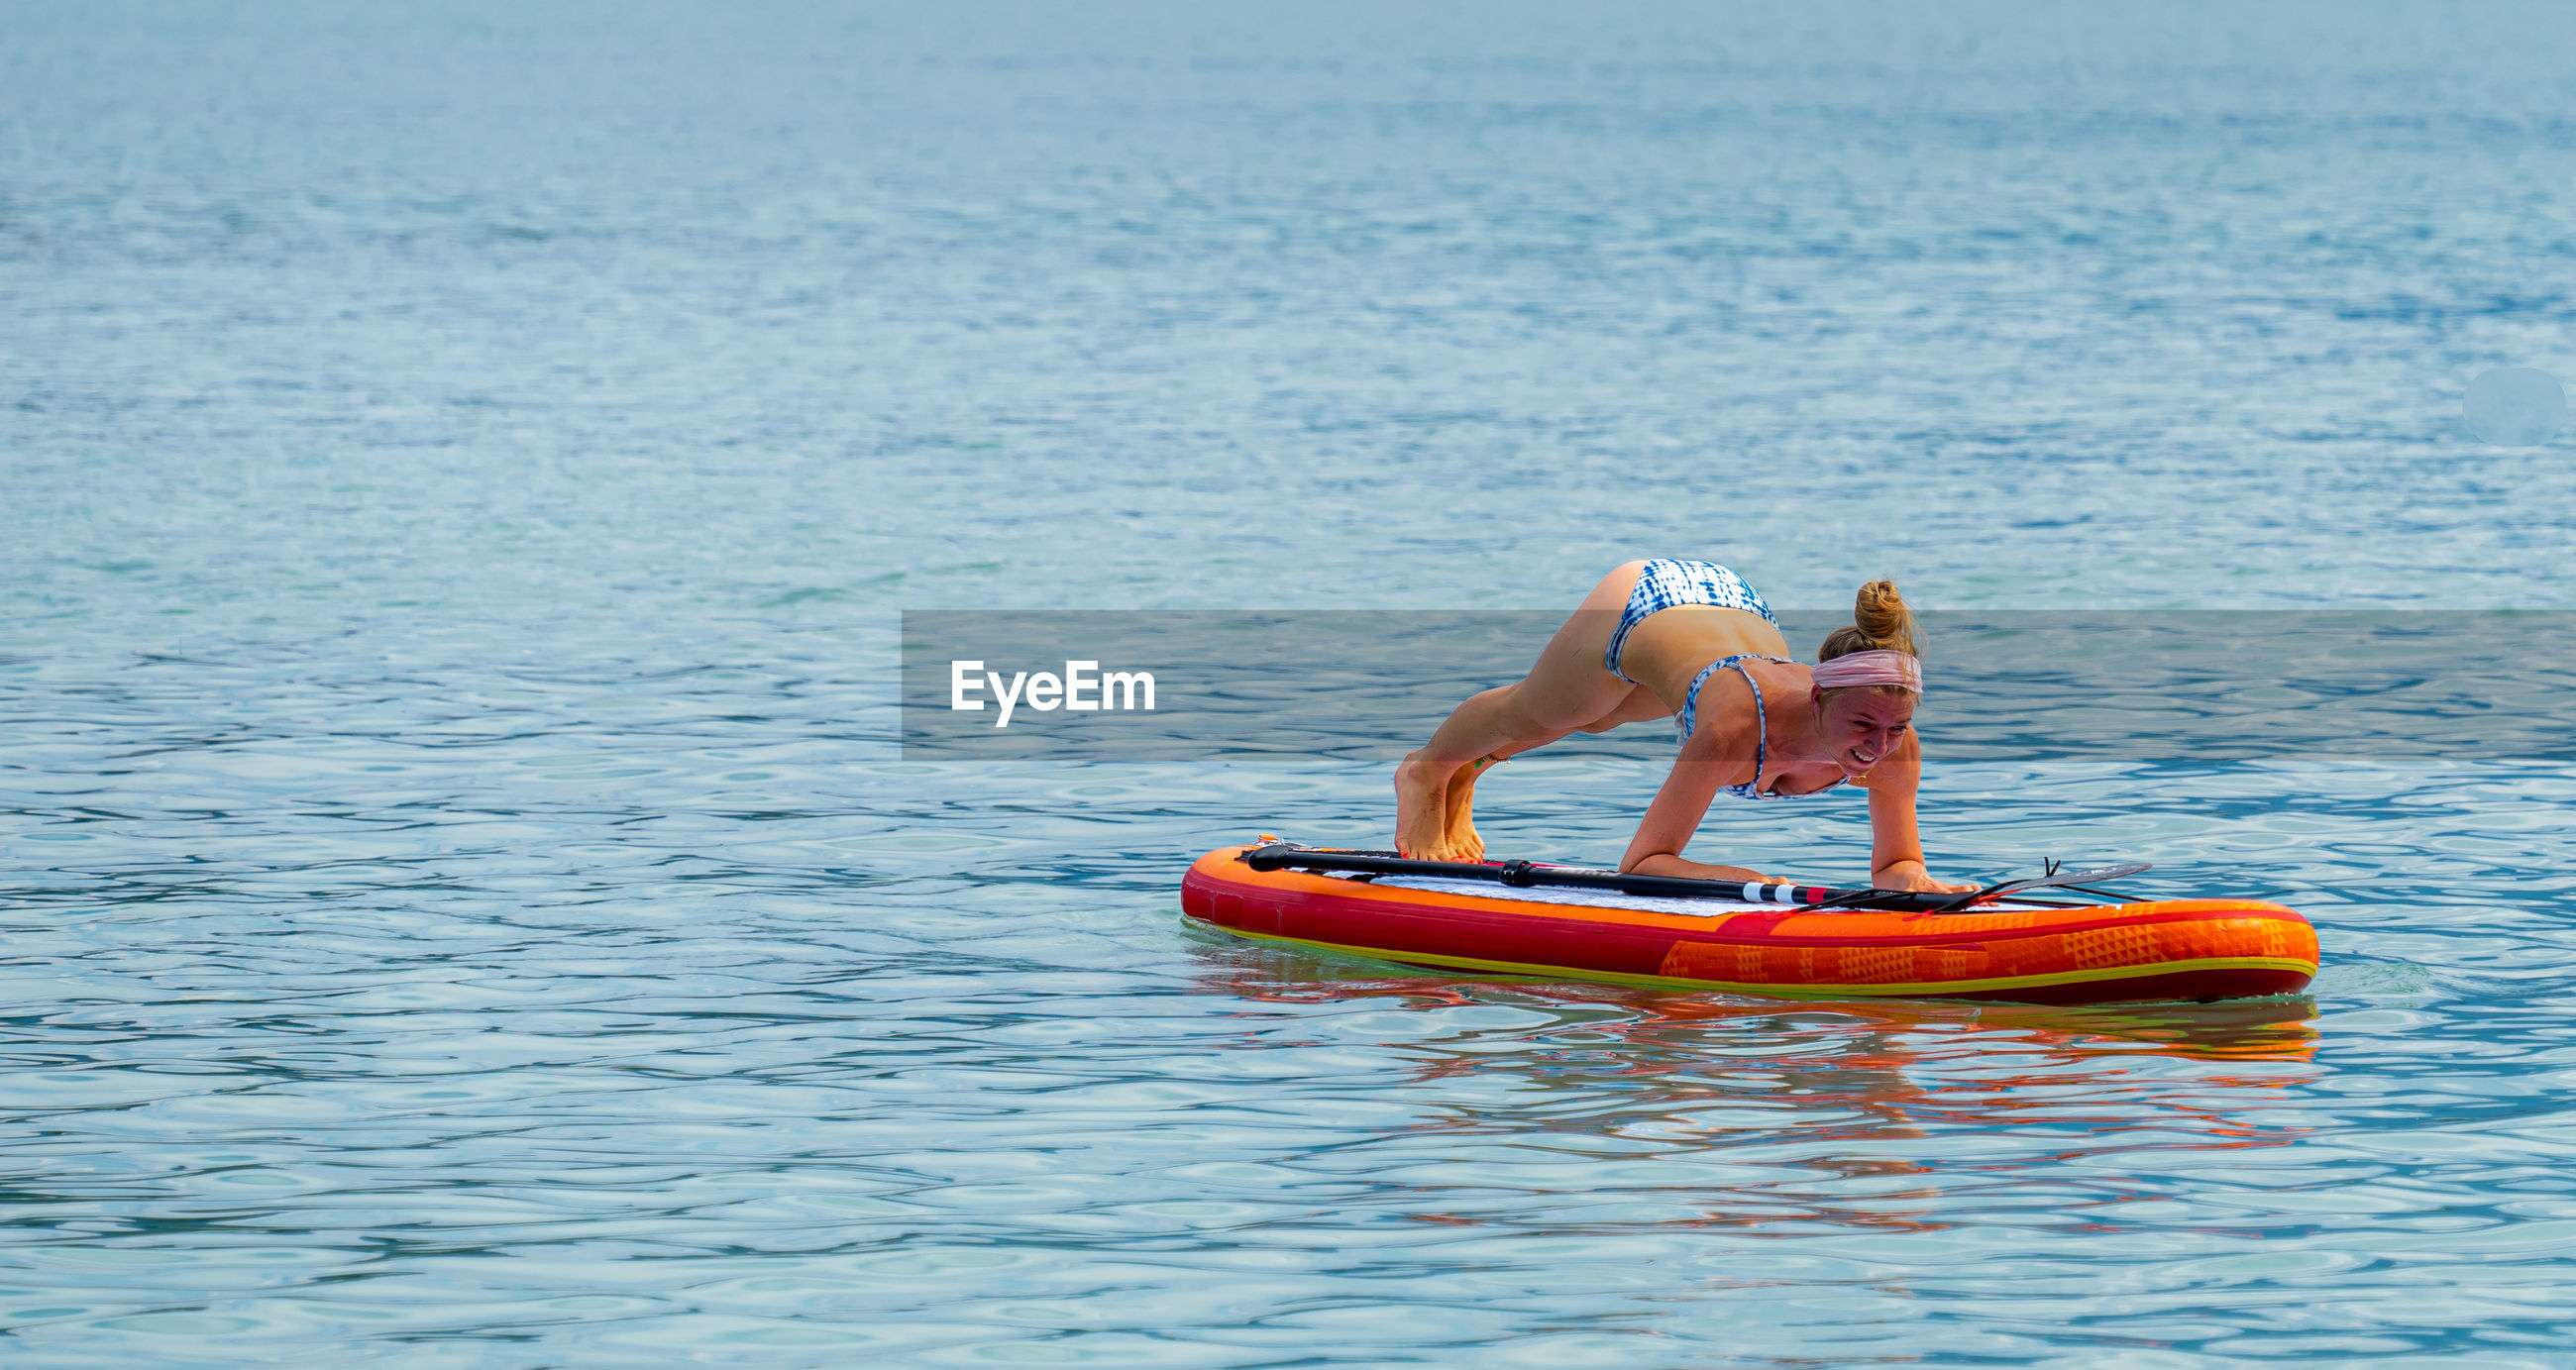 Woman exercising on paddleboard